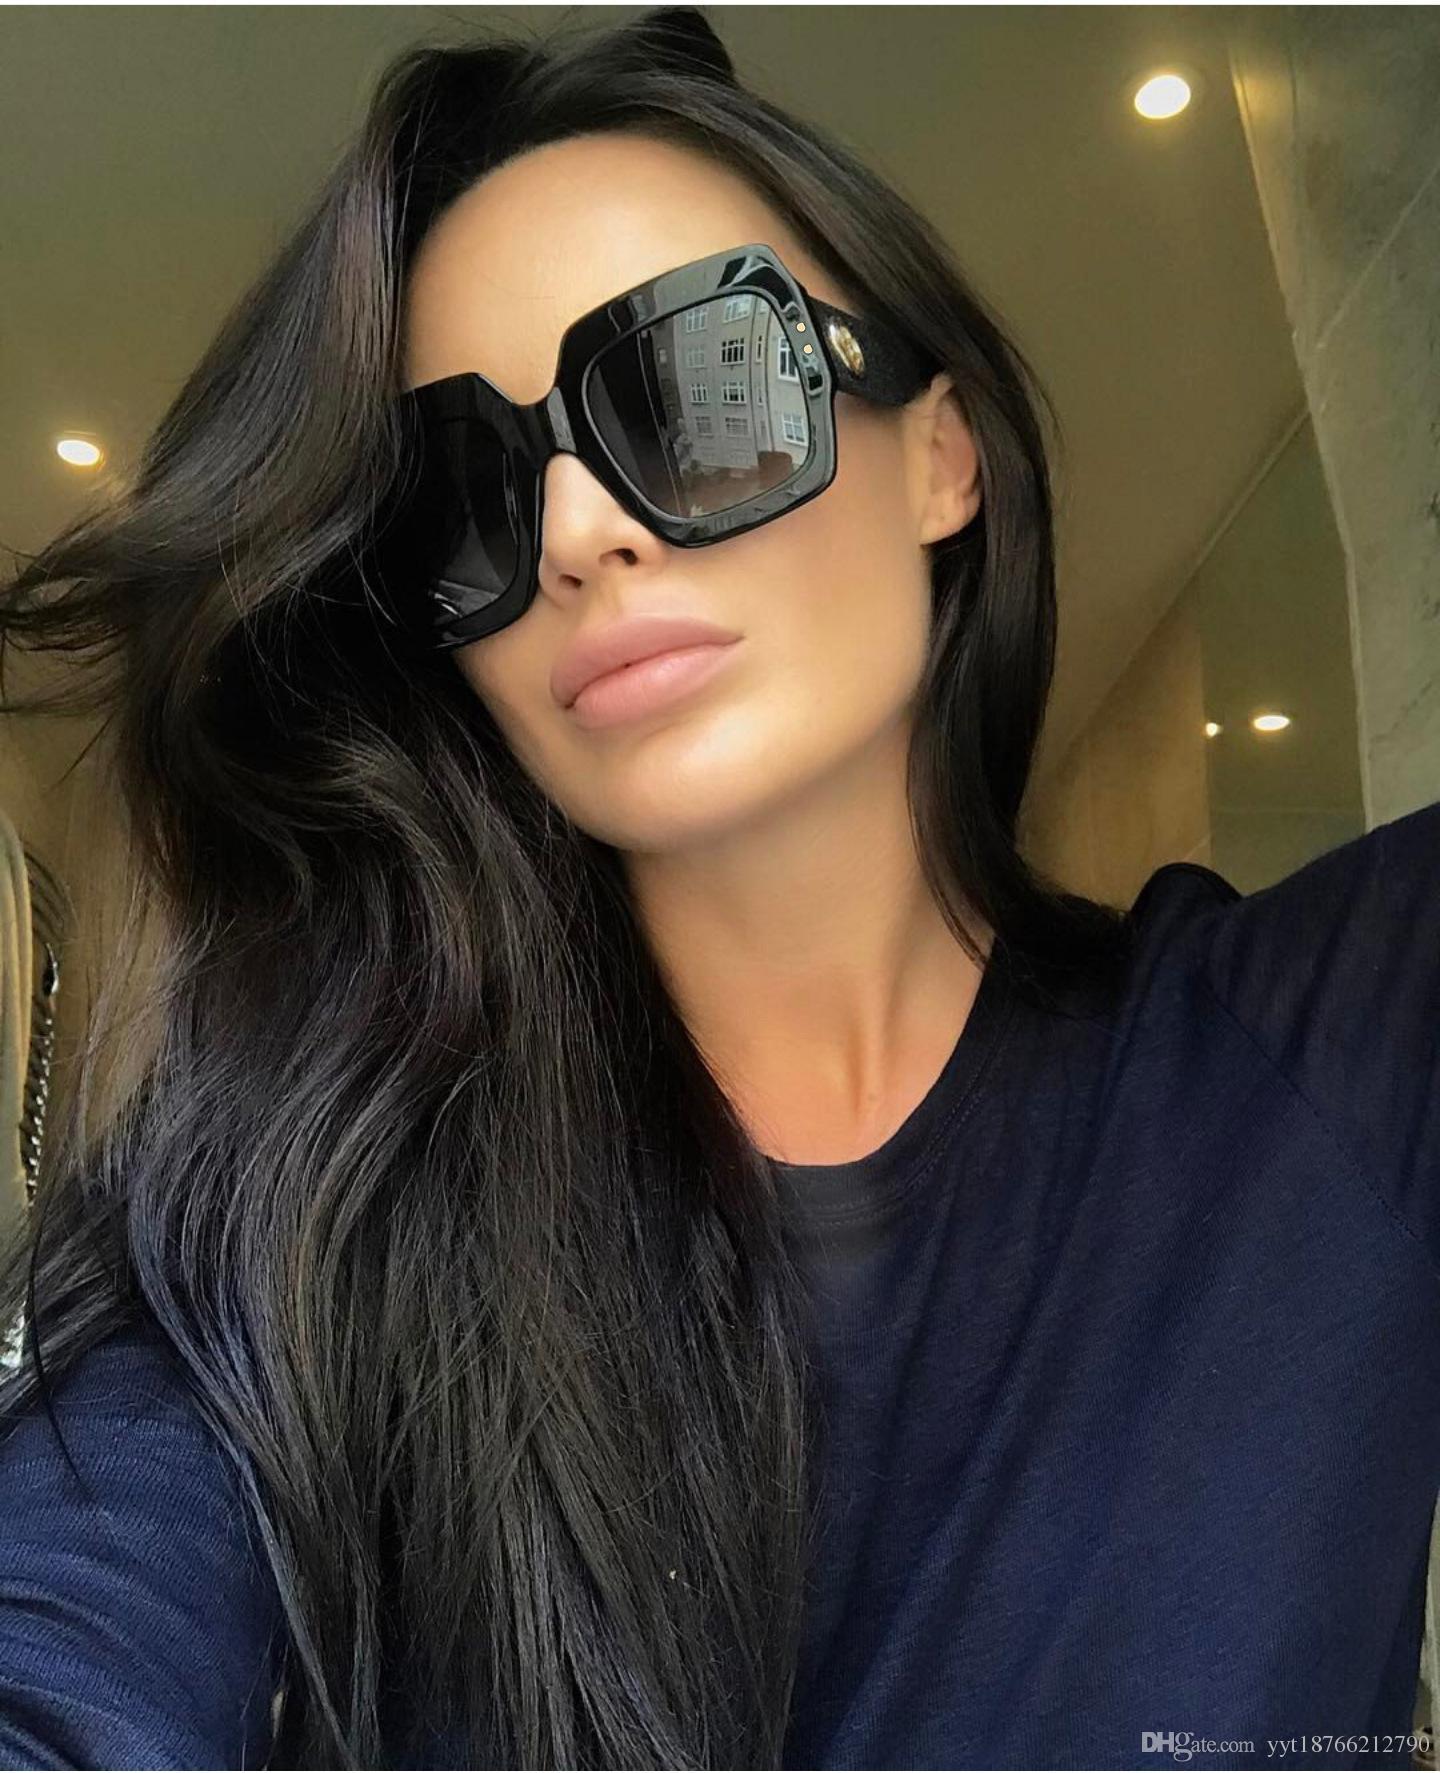 3fb2c66888 2018 Luxury Brand Italy Oversized Square Sunglasses Women Retro Fashion  Designer Big Frame Sun Glasses Female 08 Cheap Eyeglasses Online Sunglasses  At Night ...